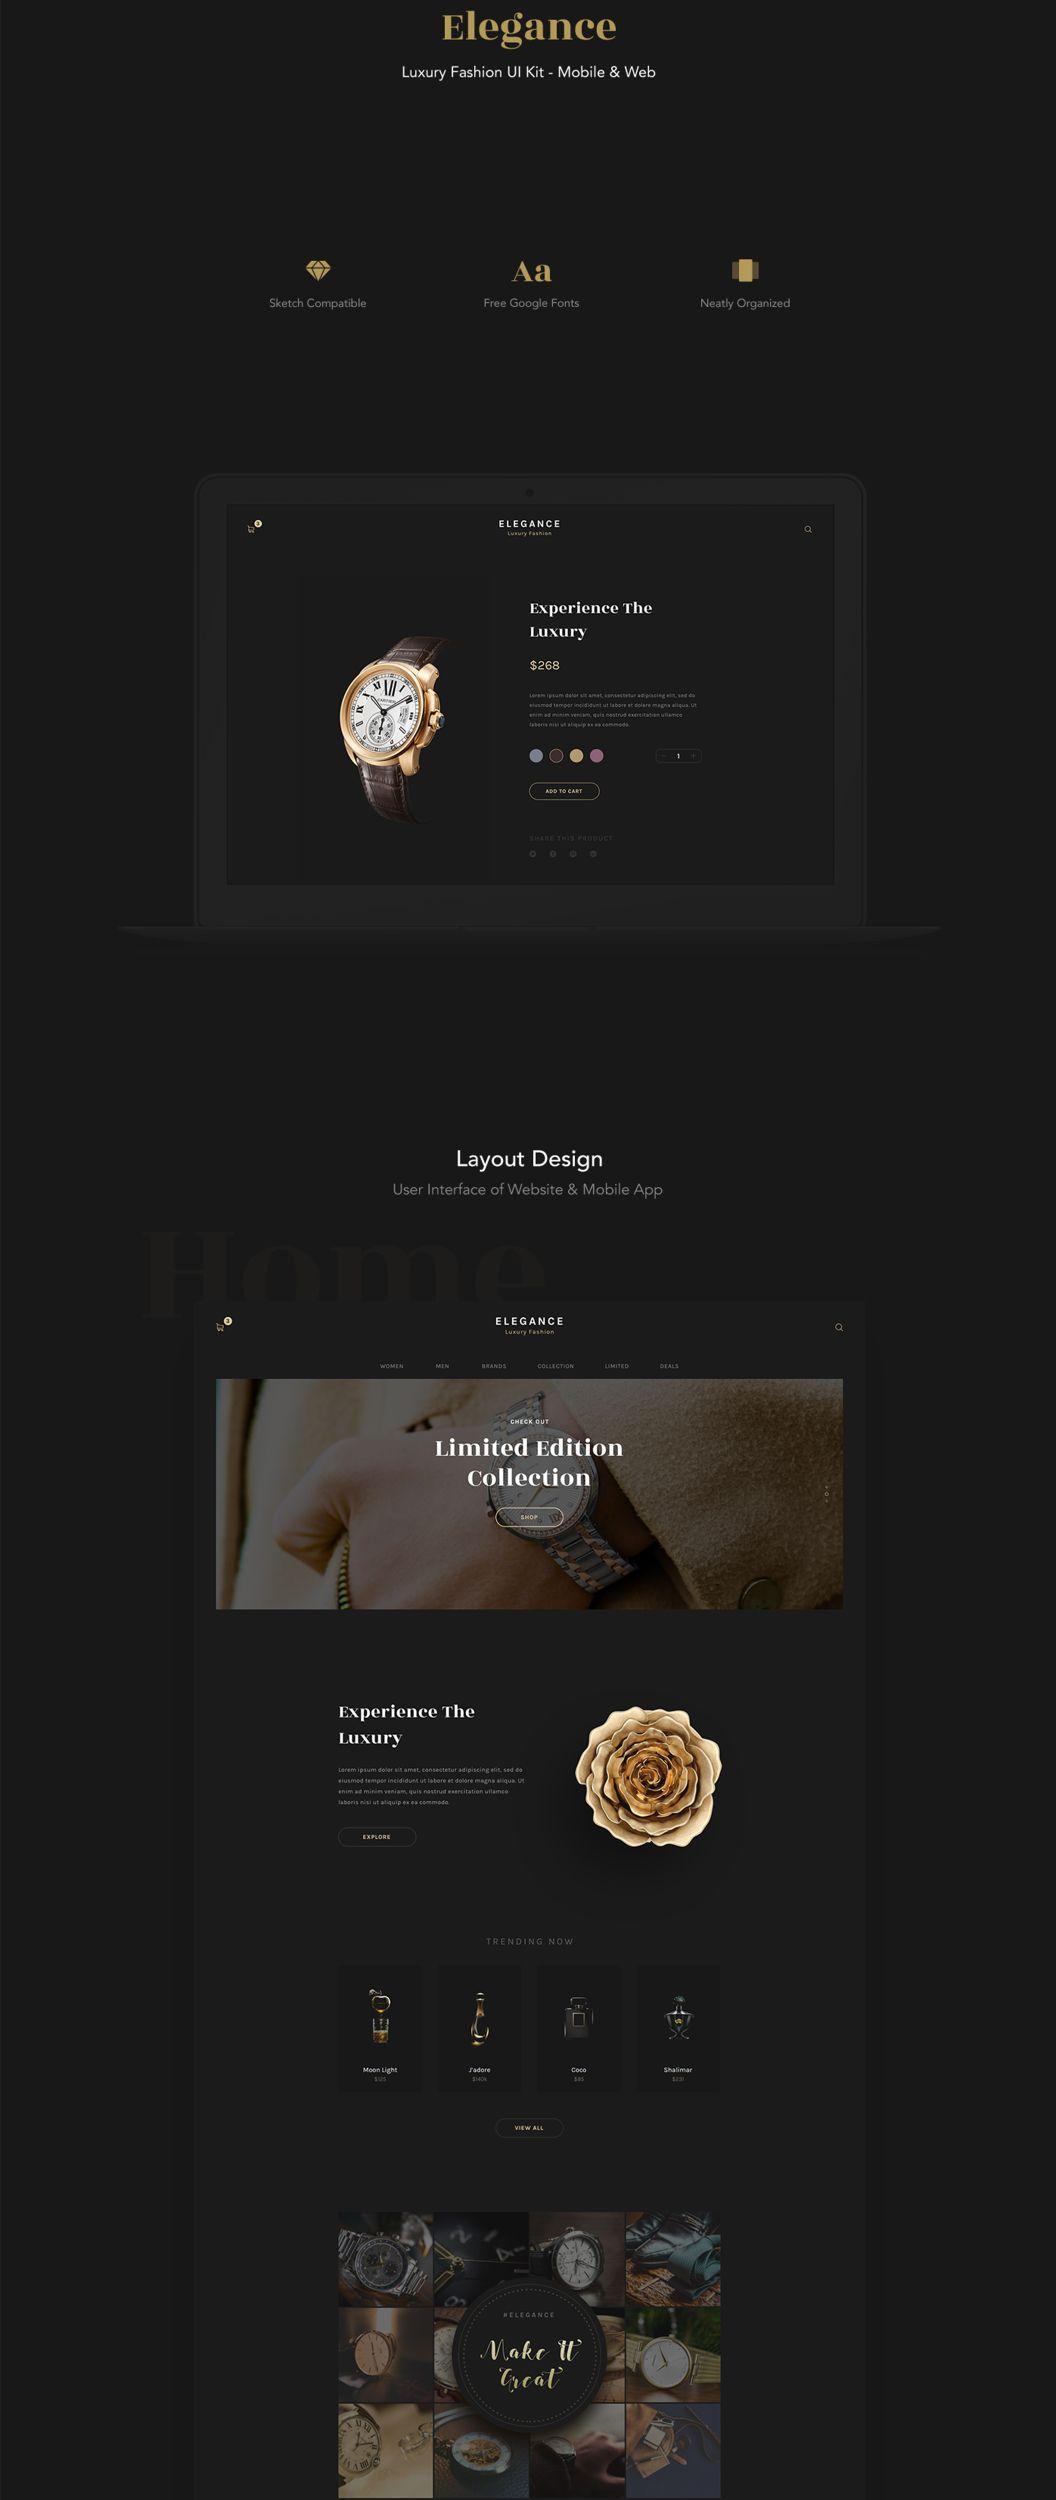 Elegance is a website u0026 mobile app